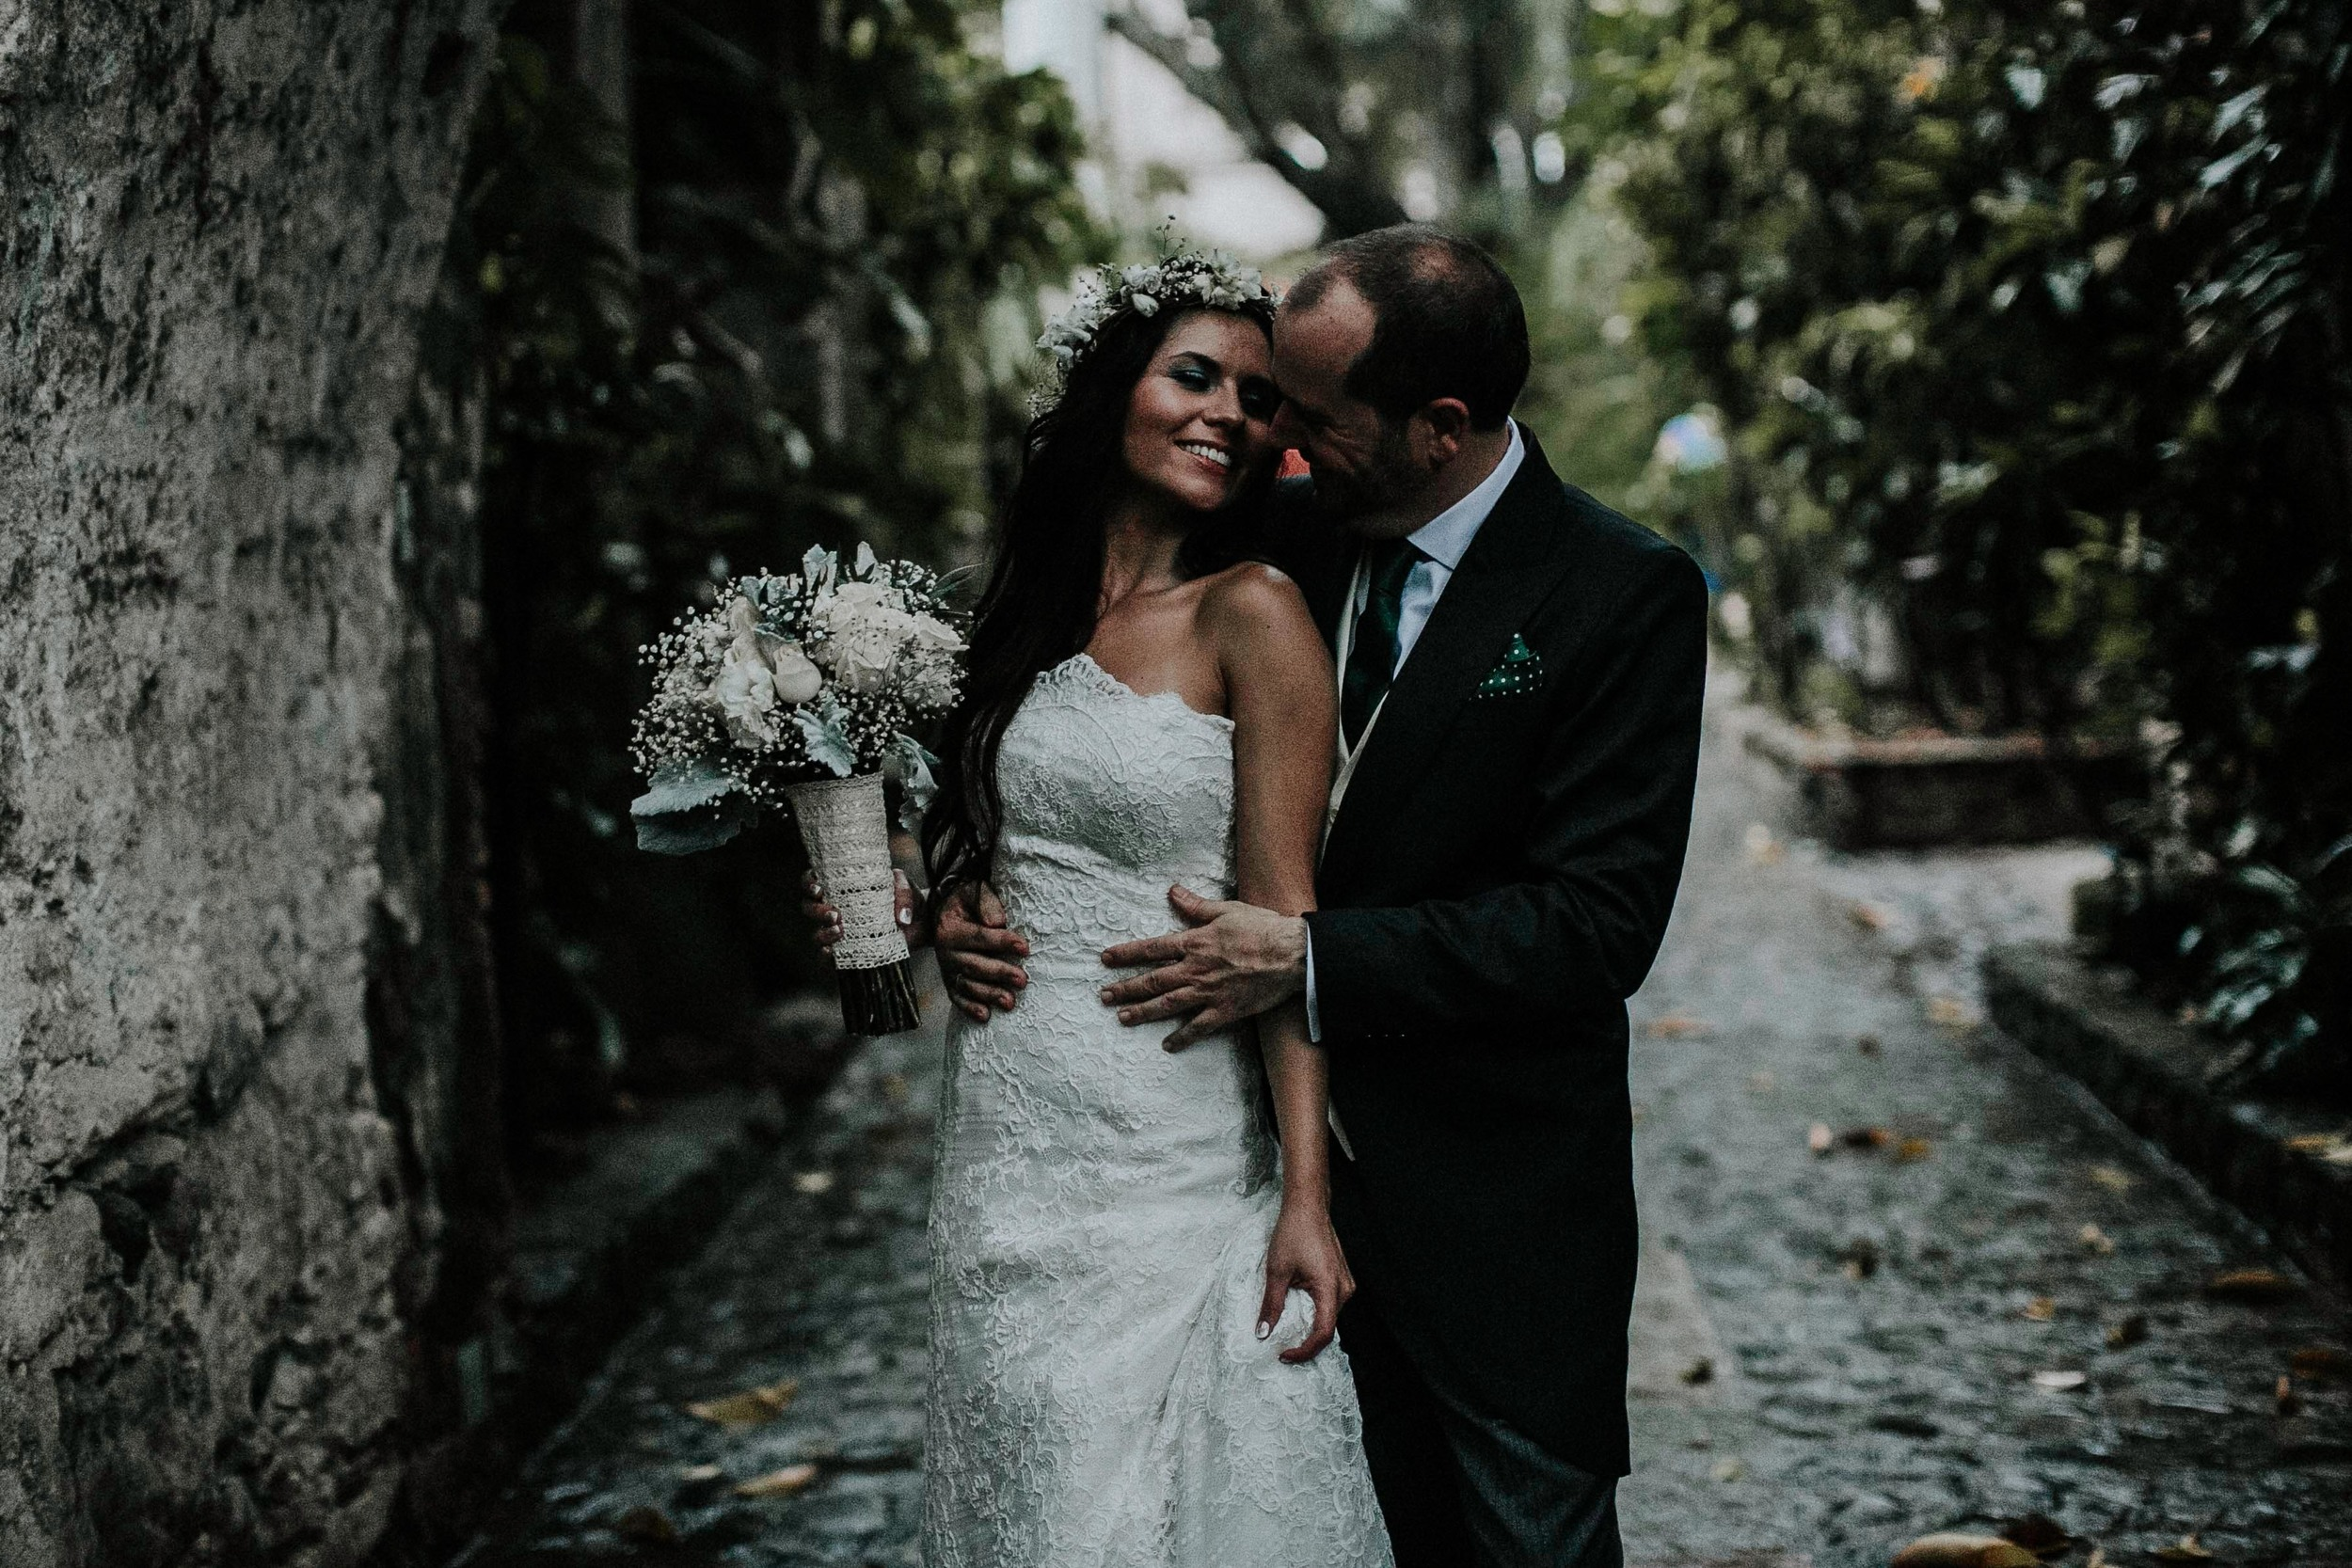 DJ8A9172-Editaralfonso_flores_destination_wedding_photographer_San_gabriel_de_las_palmas.jpg